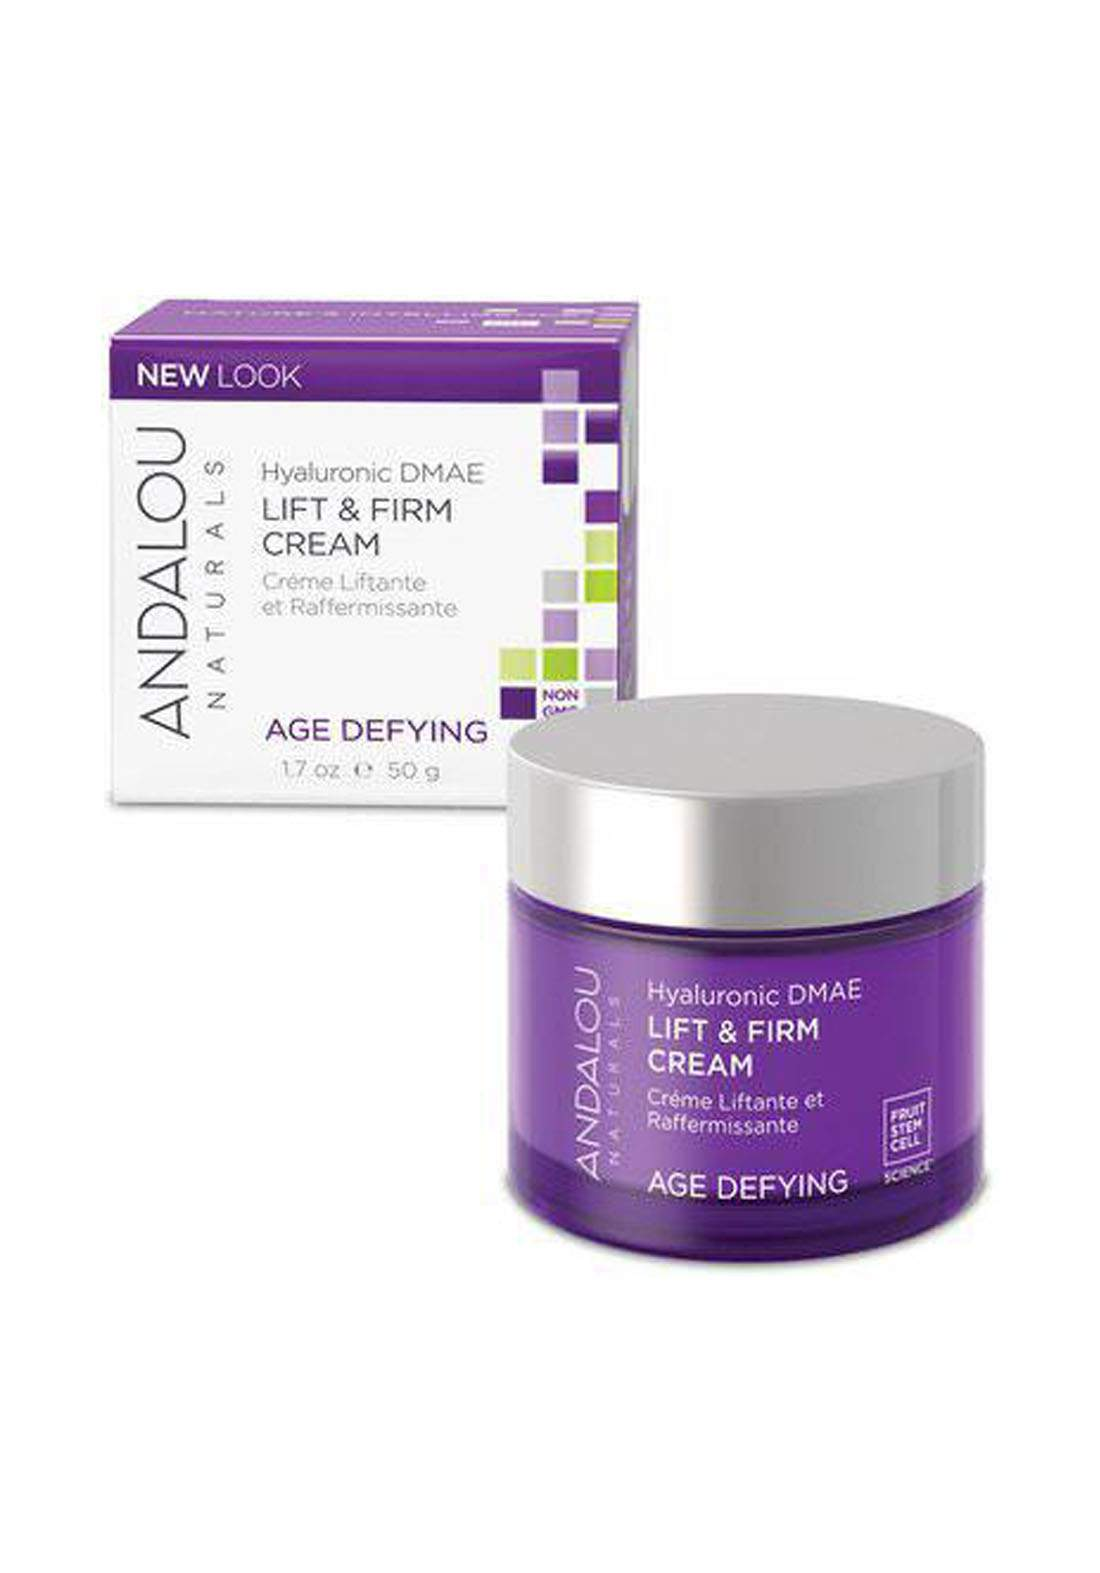 Andalou 2294 Naturals Age Defying Goji Peptide Perfecting Cream 50g كريم للوجه